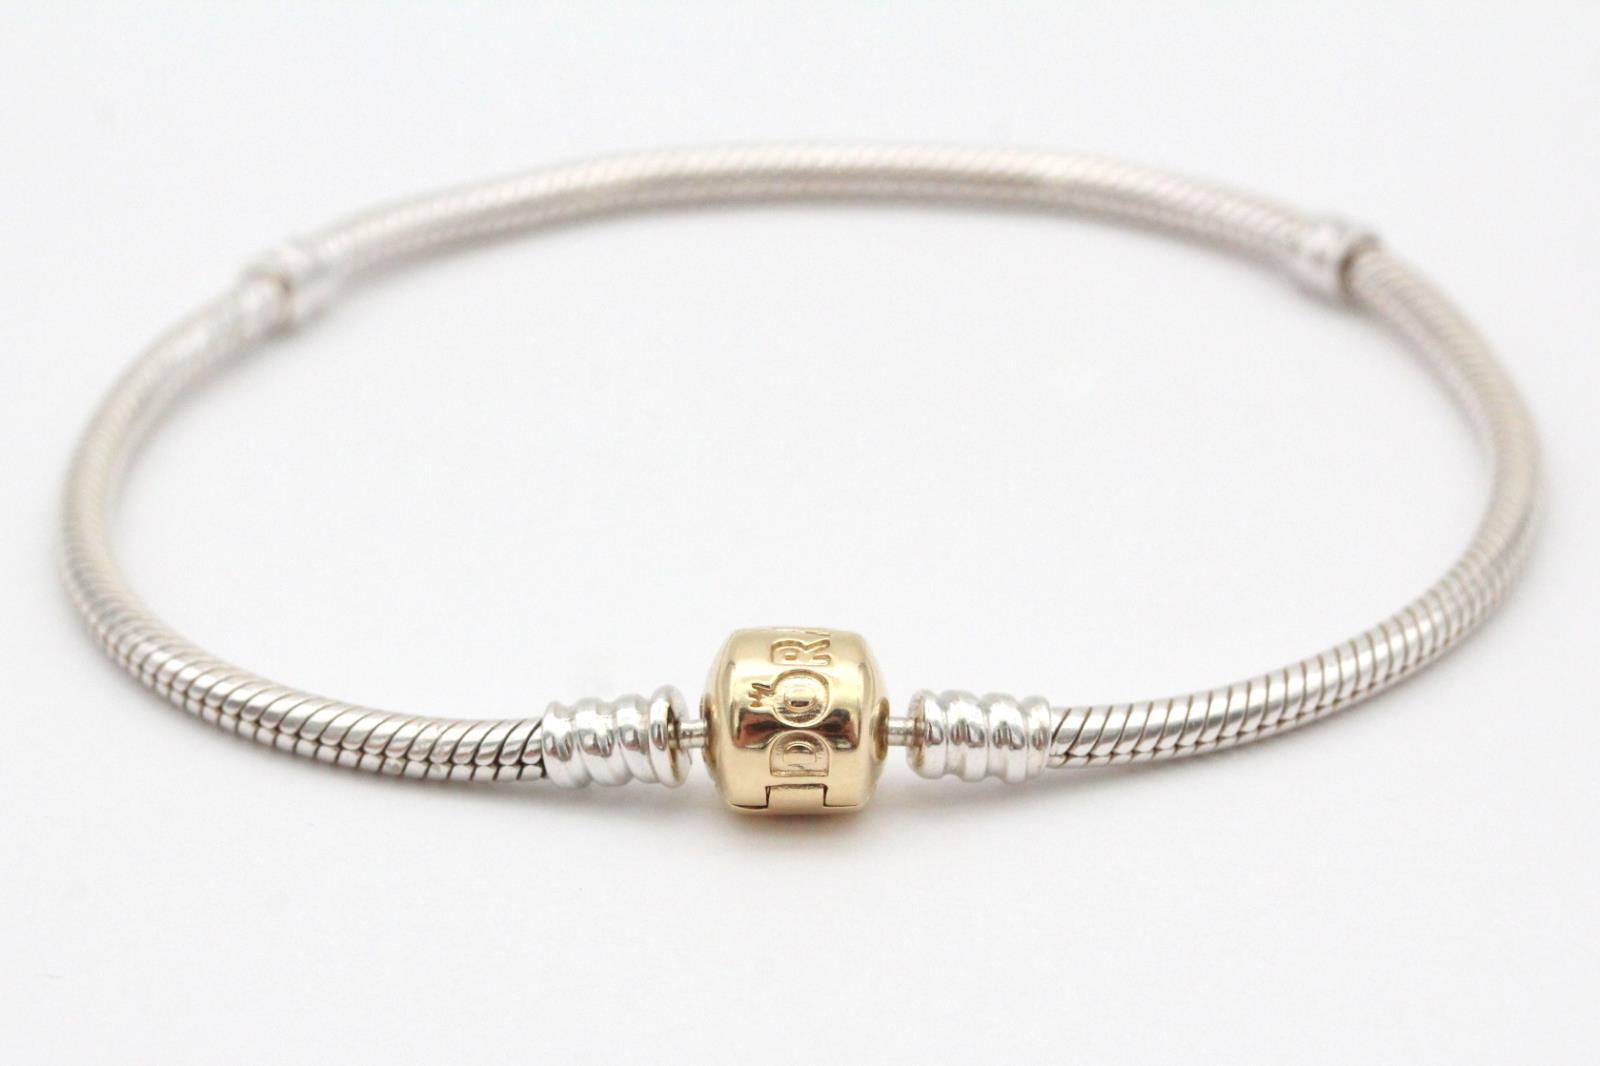 Pandora 590702hg Sterling Silver 14k Yellow Gold 21cm Charm Bracelet New Ebay